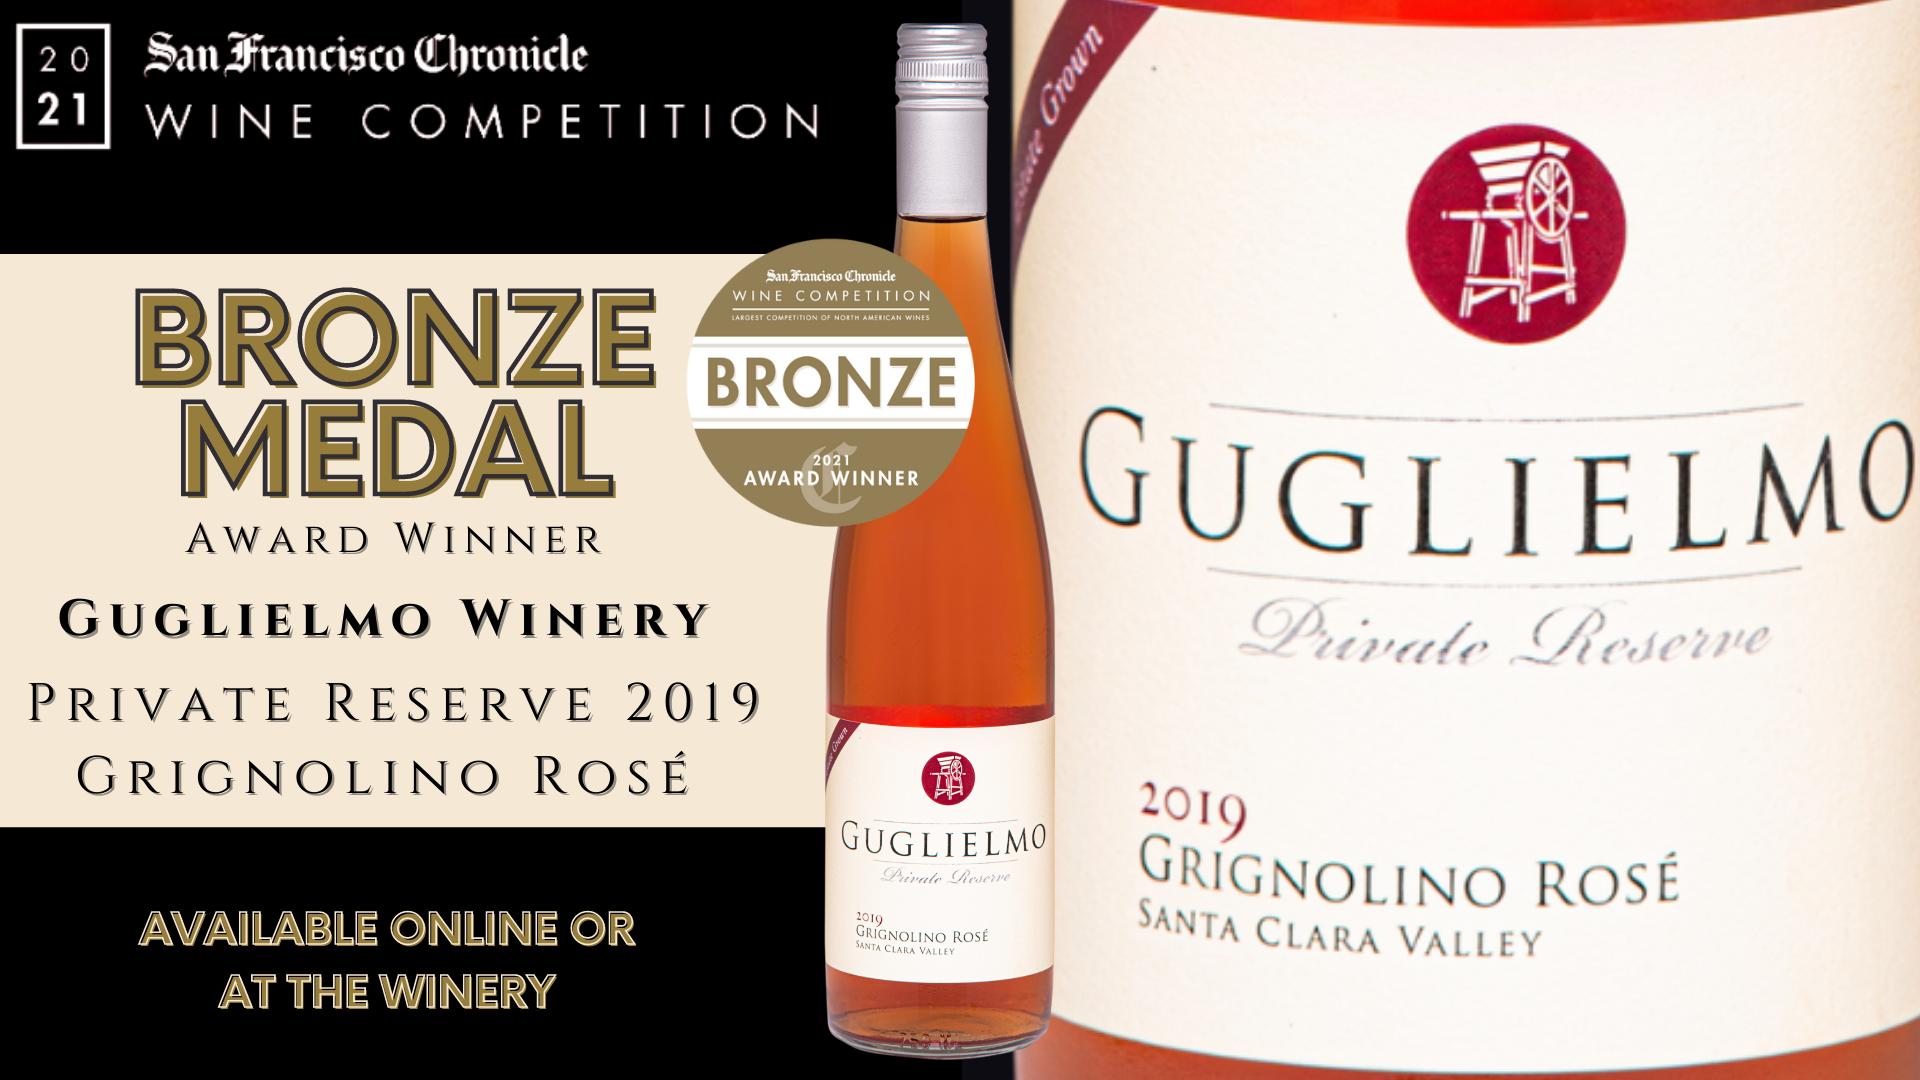 San Francisco Chronicle Wine Competition 2021 Gold Medal Award Winner 2019 Guglielmo Private Reserve Estate Grown Grignolino Rosé